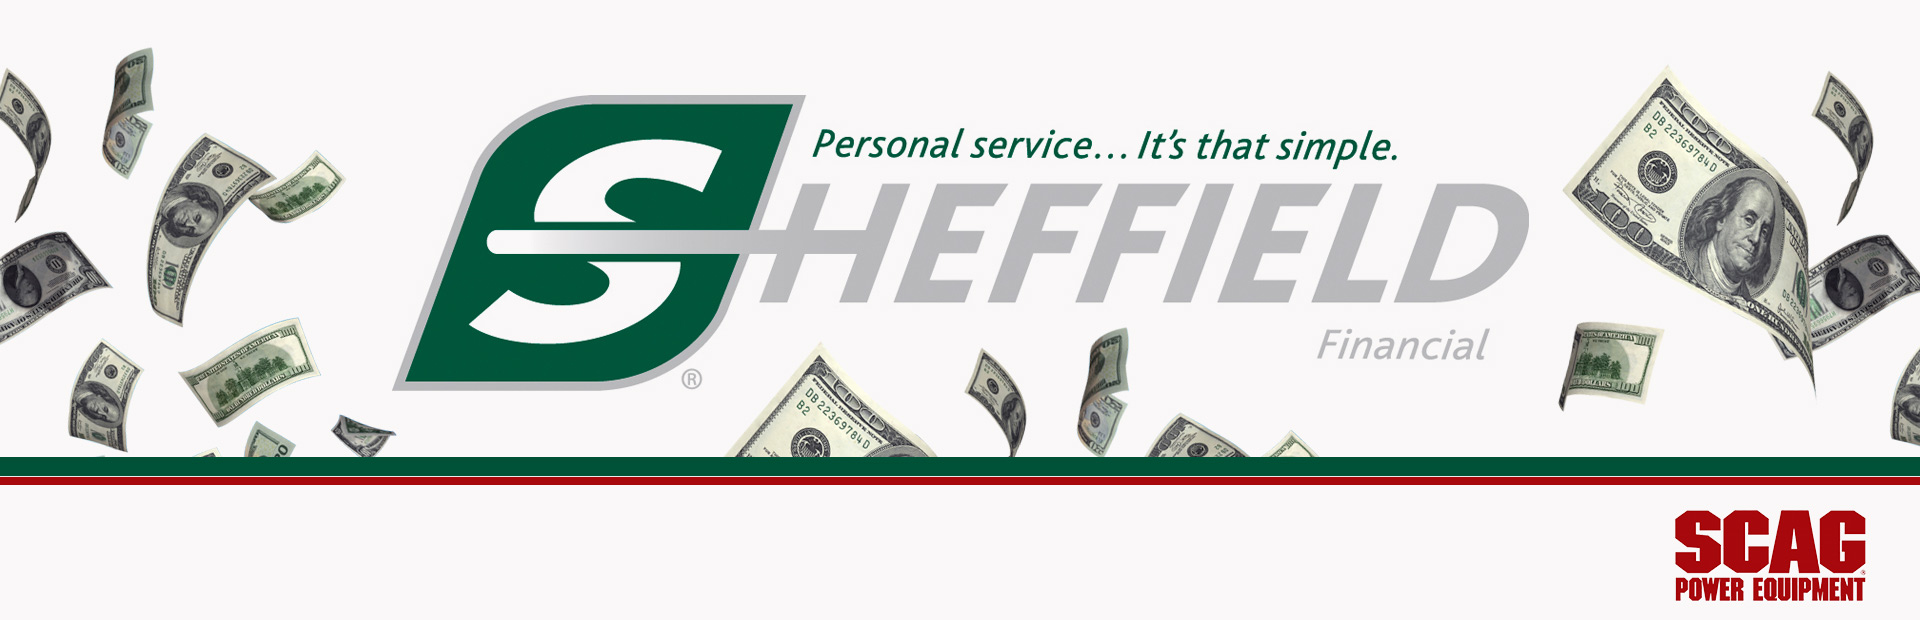 Charmant Scag: Sheffield Financing Programs